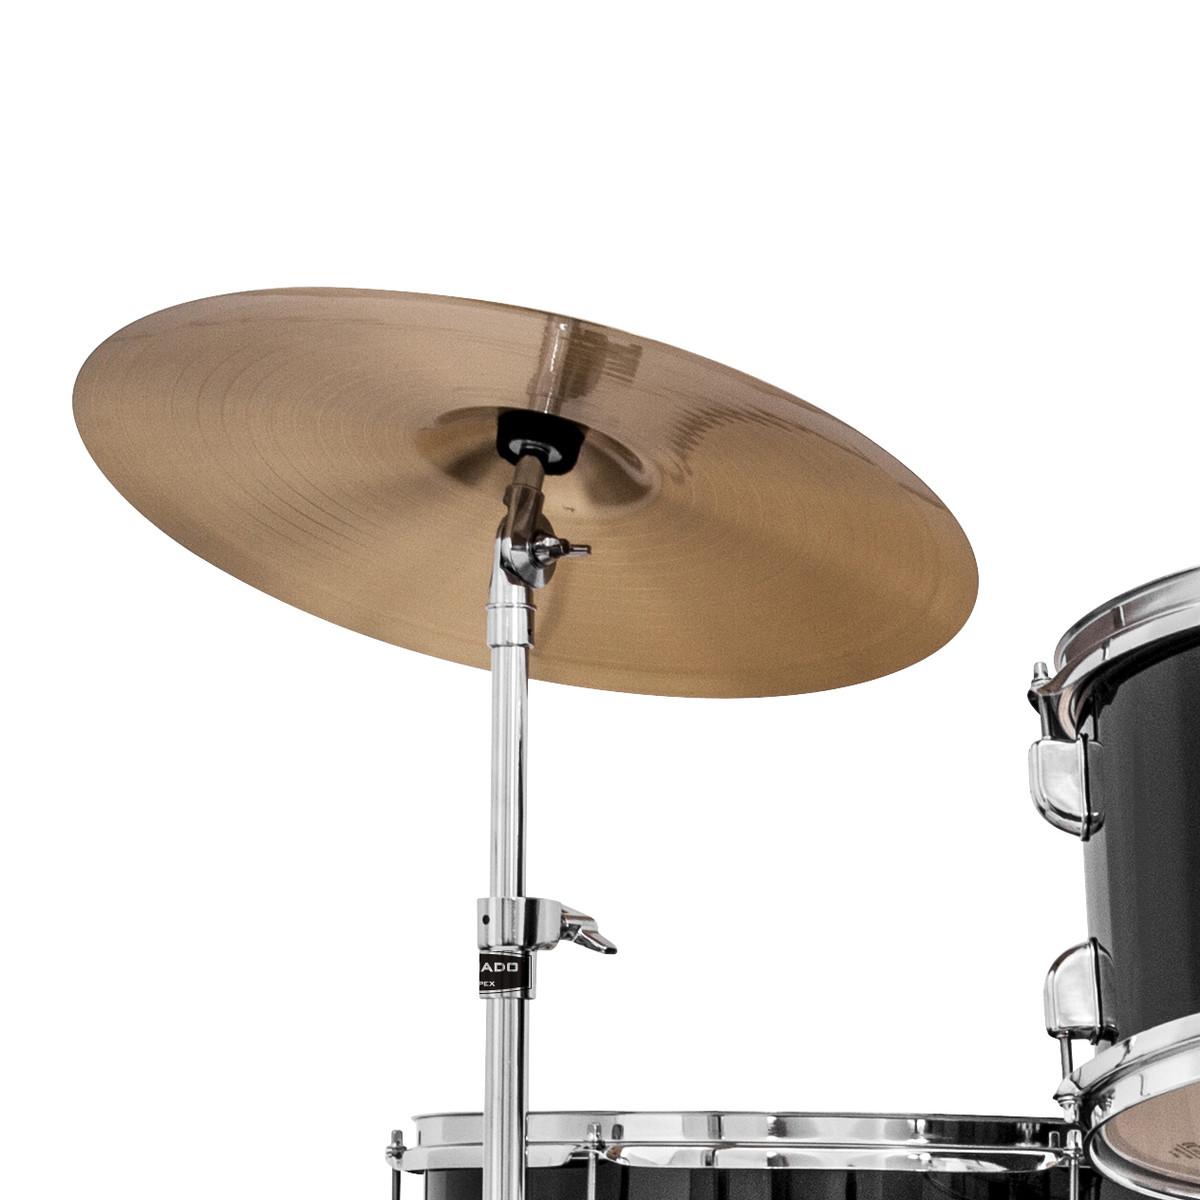 mapex tornado iii 22 39 39 rock drum kit black with extra crash at. Black Bedroom Furniture Sets. Home Design Ideas